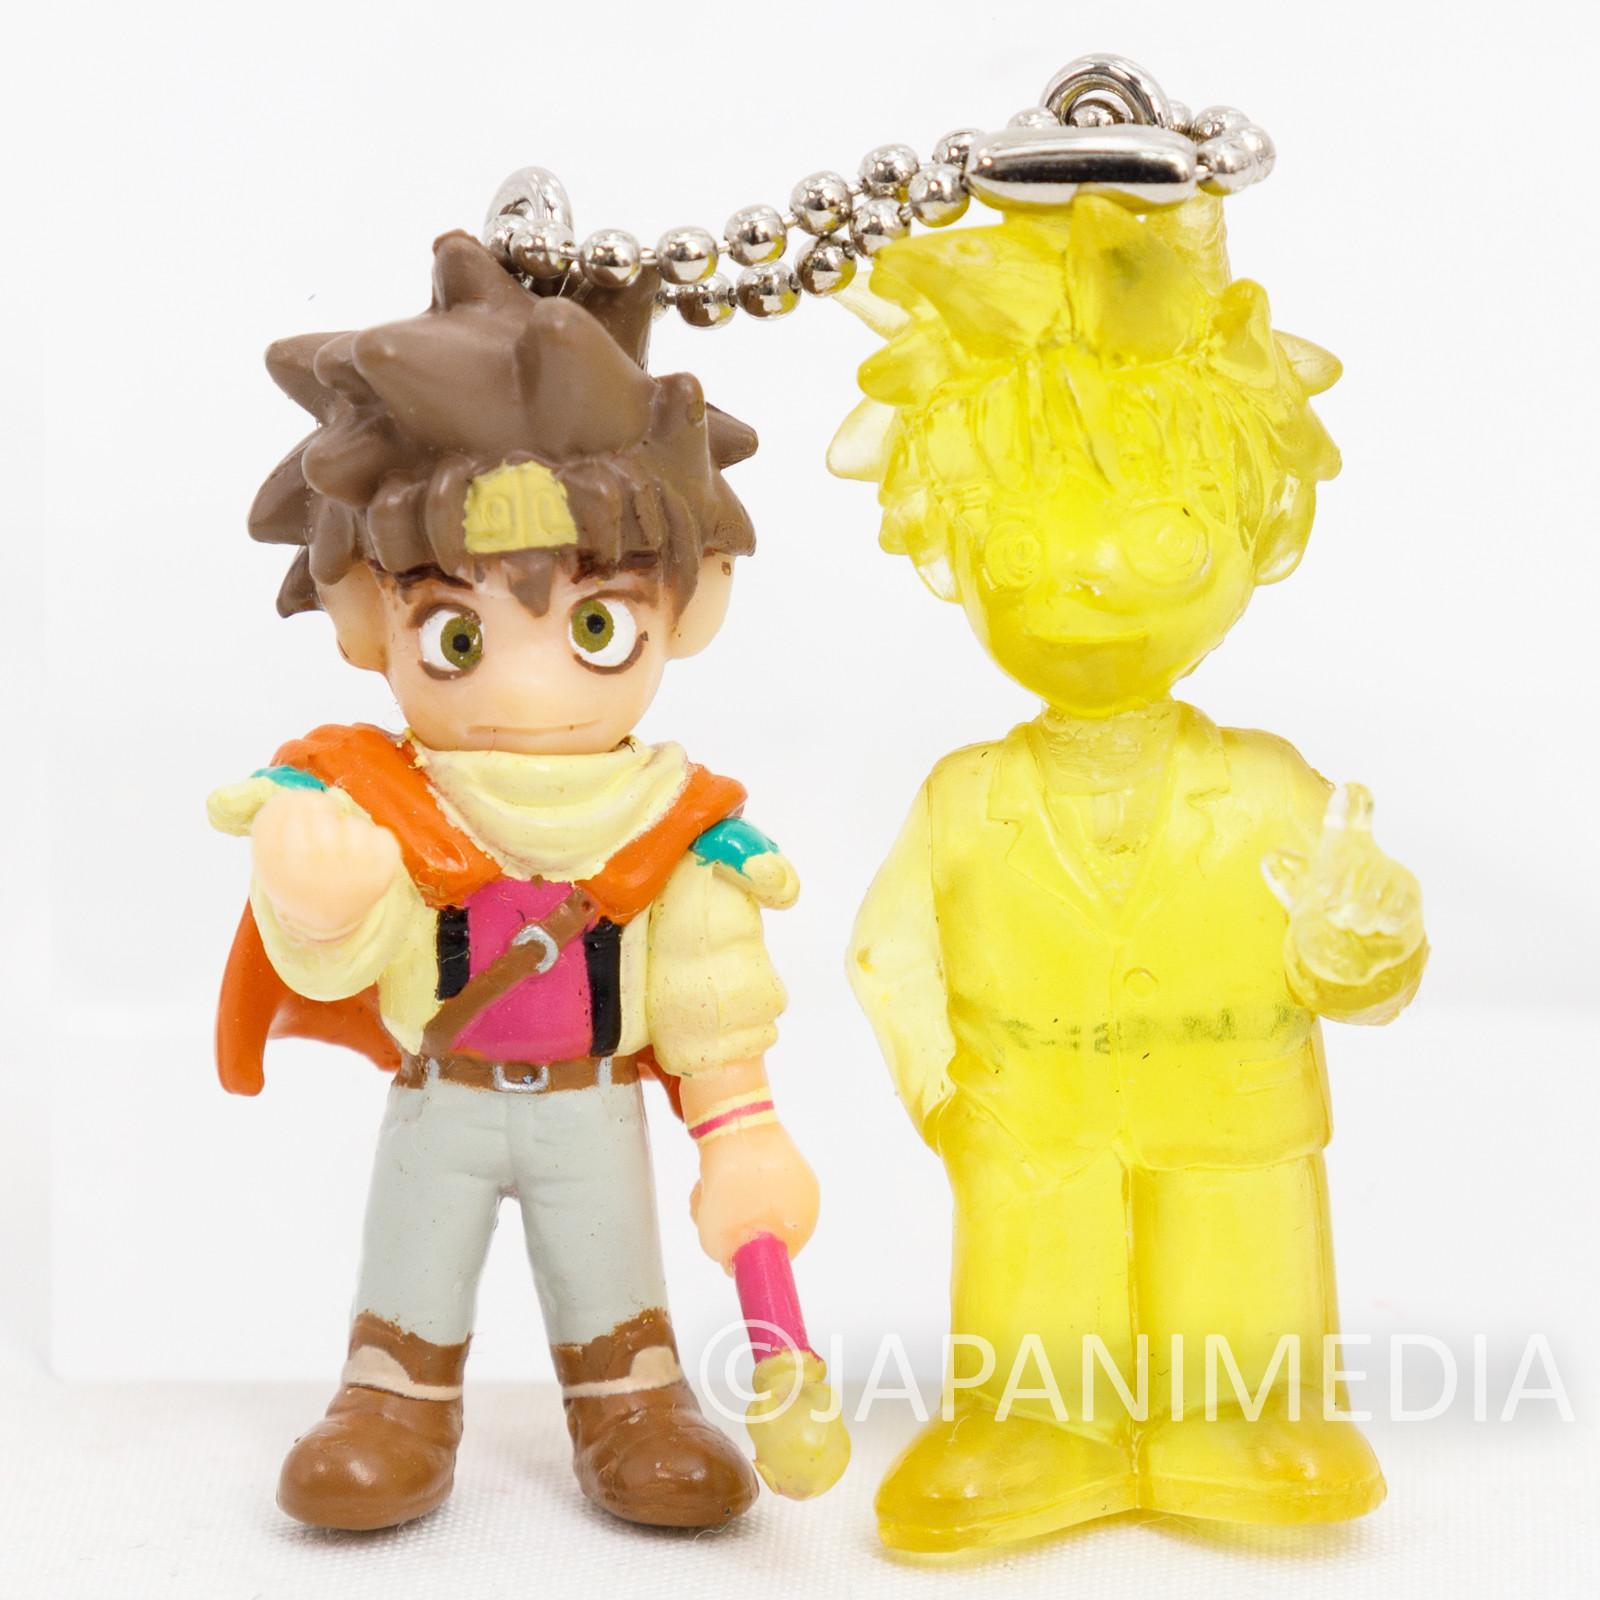 Gensomaden SAIYUKI Son Goku Mascot Figure Twin Keychain JAPAN ANIME MANGA 2